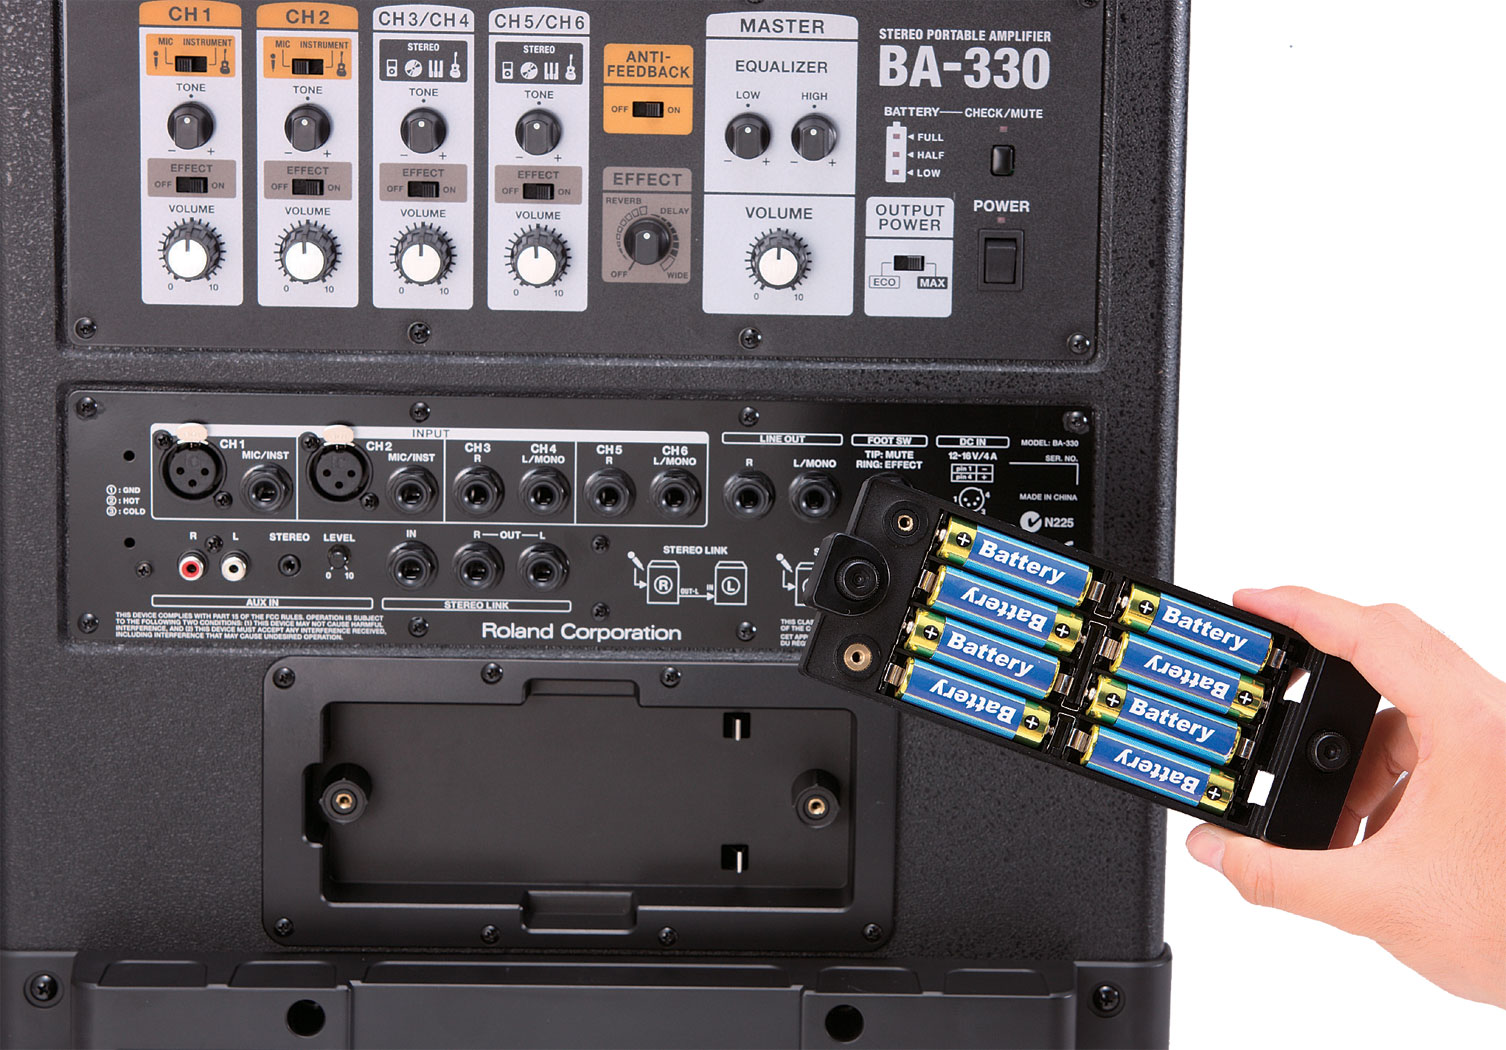 roland ba 330 stereo portable amplifier rh roland com Used Roland BA-330 Roland BA-330 Watts